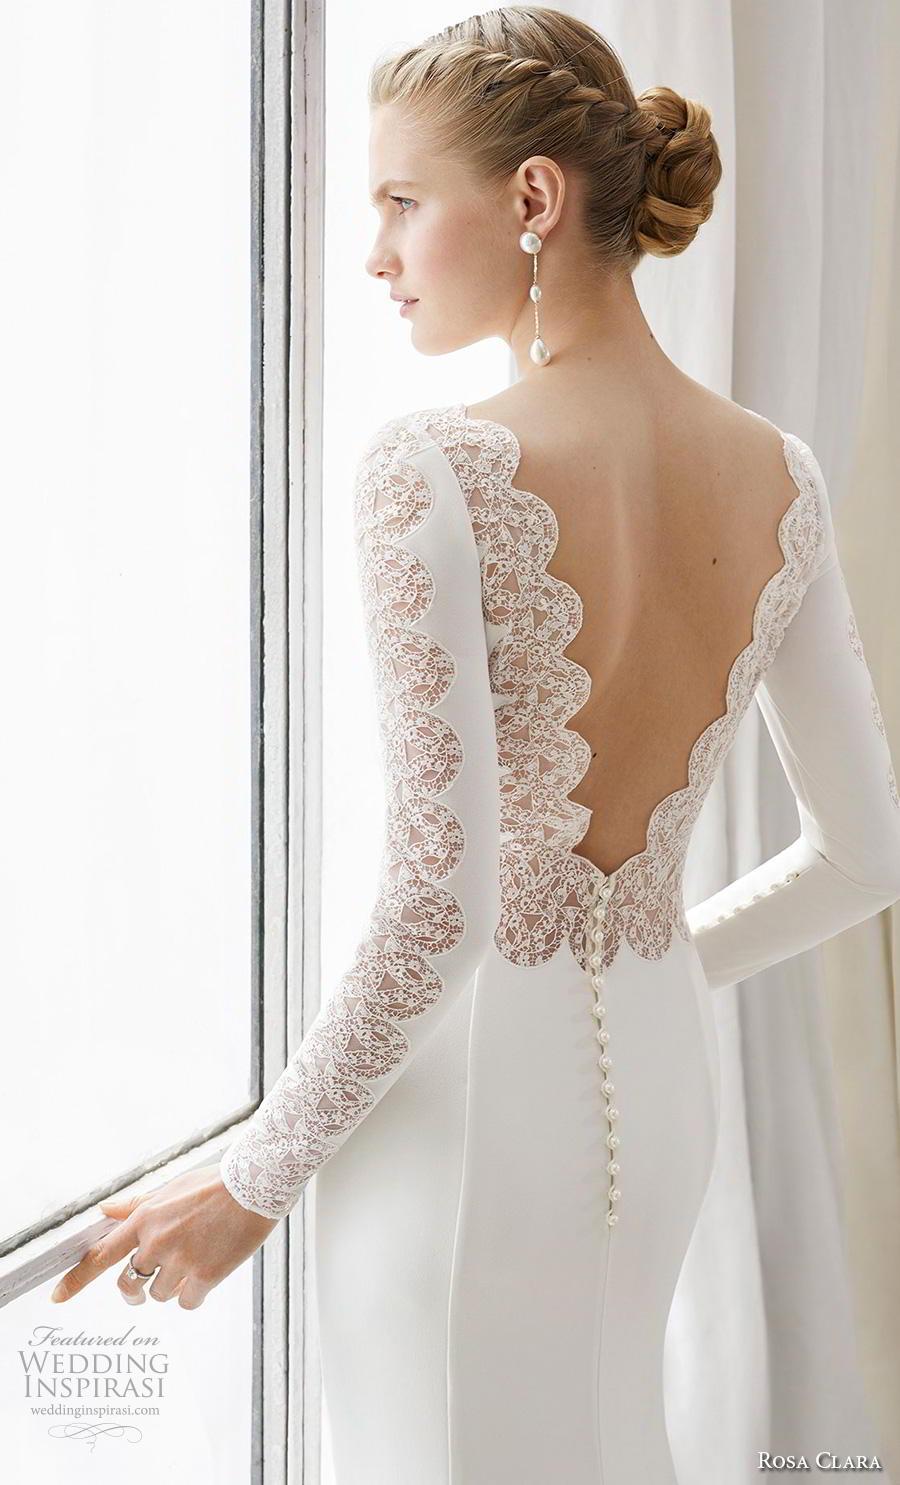 rosa clara 2019 couture bridal long sleeves bateau neckline simple minimalist elegant fit and flare sheath wedding dress v back chapel train (7) zbv